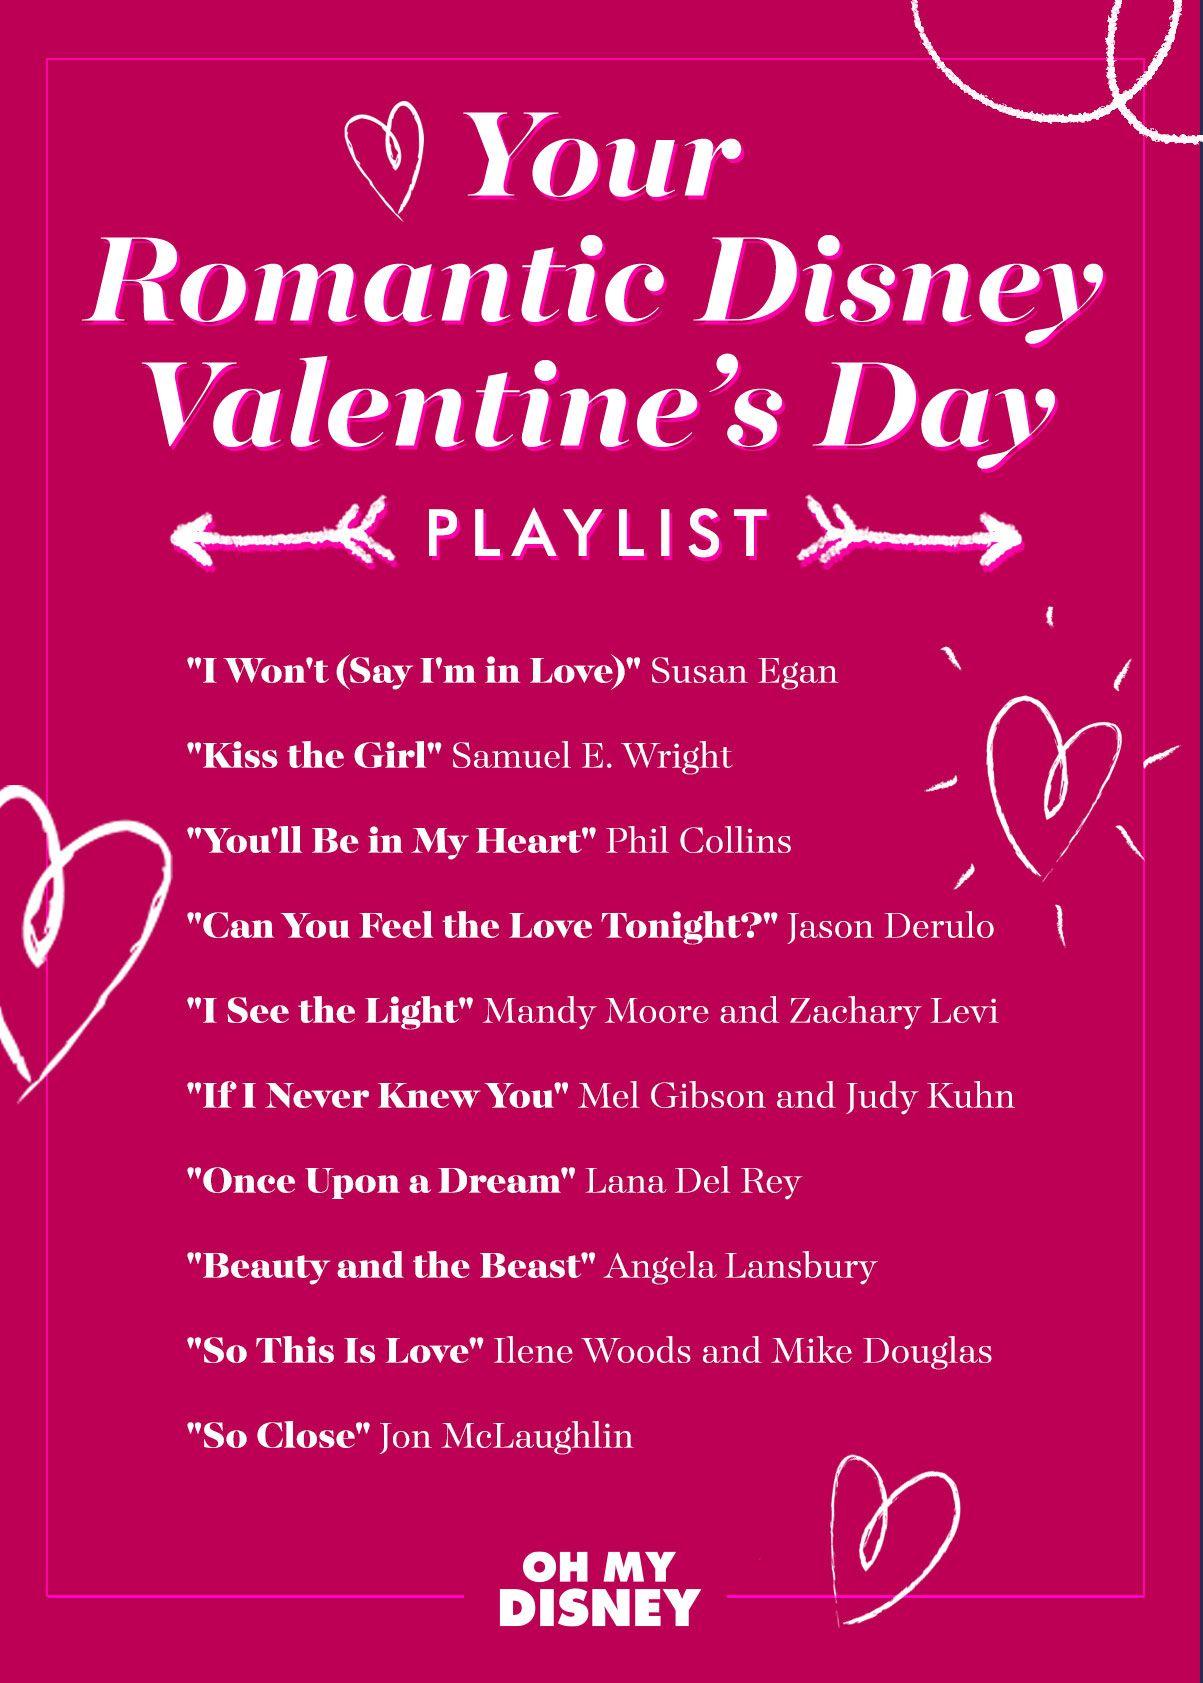 Disney Wedding Songs.Valentine S Day Playlist Your Romantic Disney Picks Music